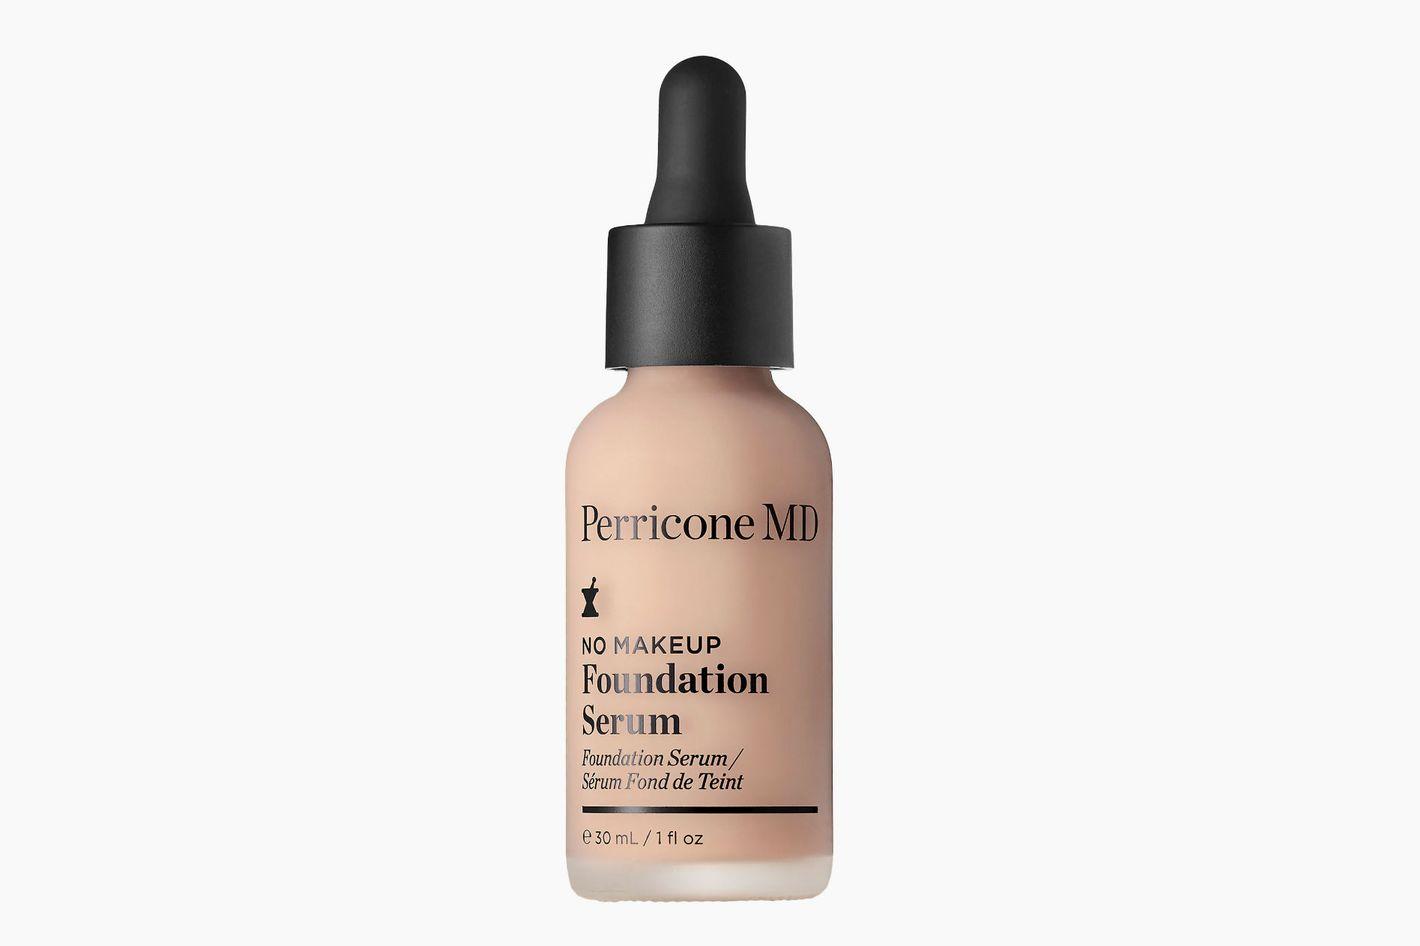 Perricone MD No Makeup Foundation Serum